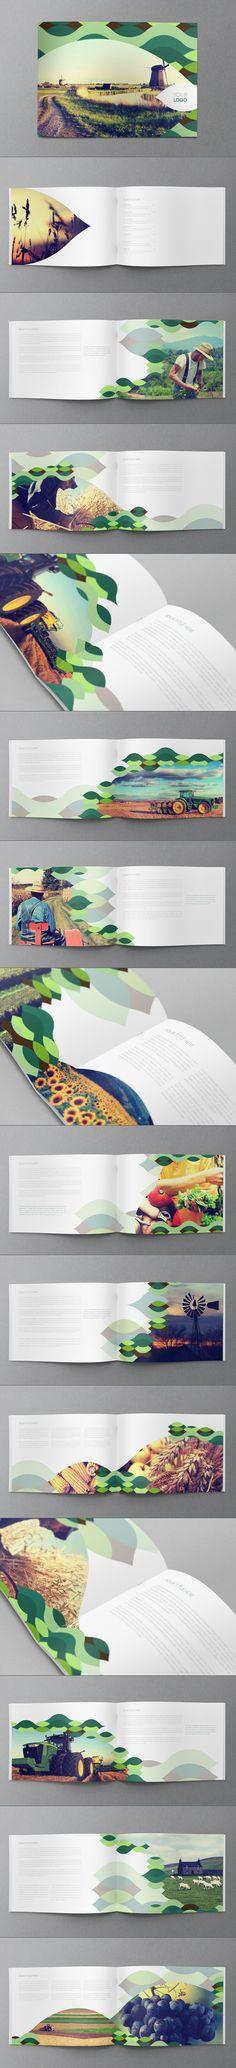 Green Nature Brochure by Abra Design, via Behance